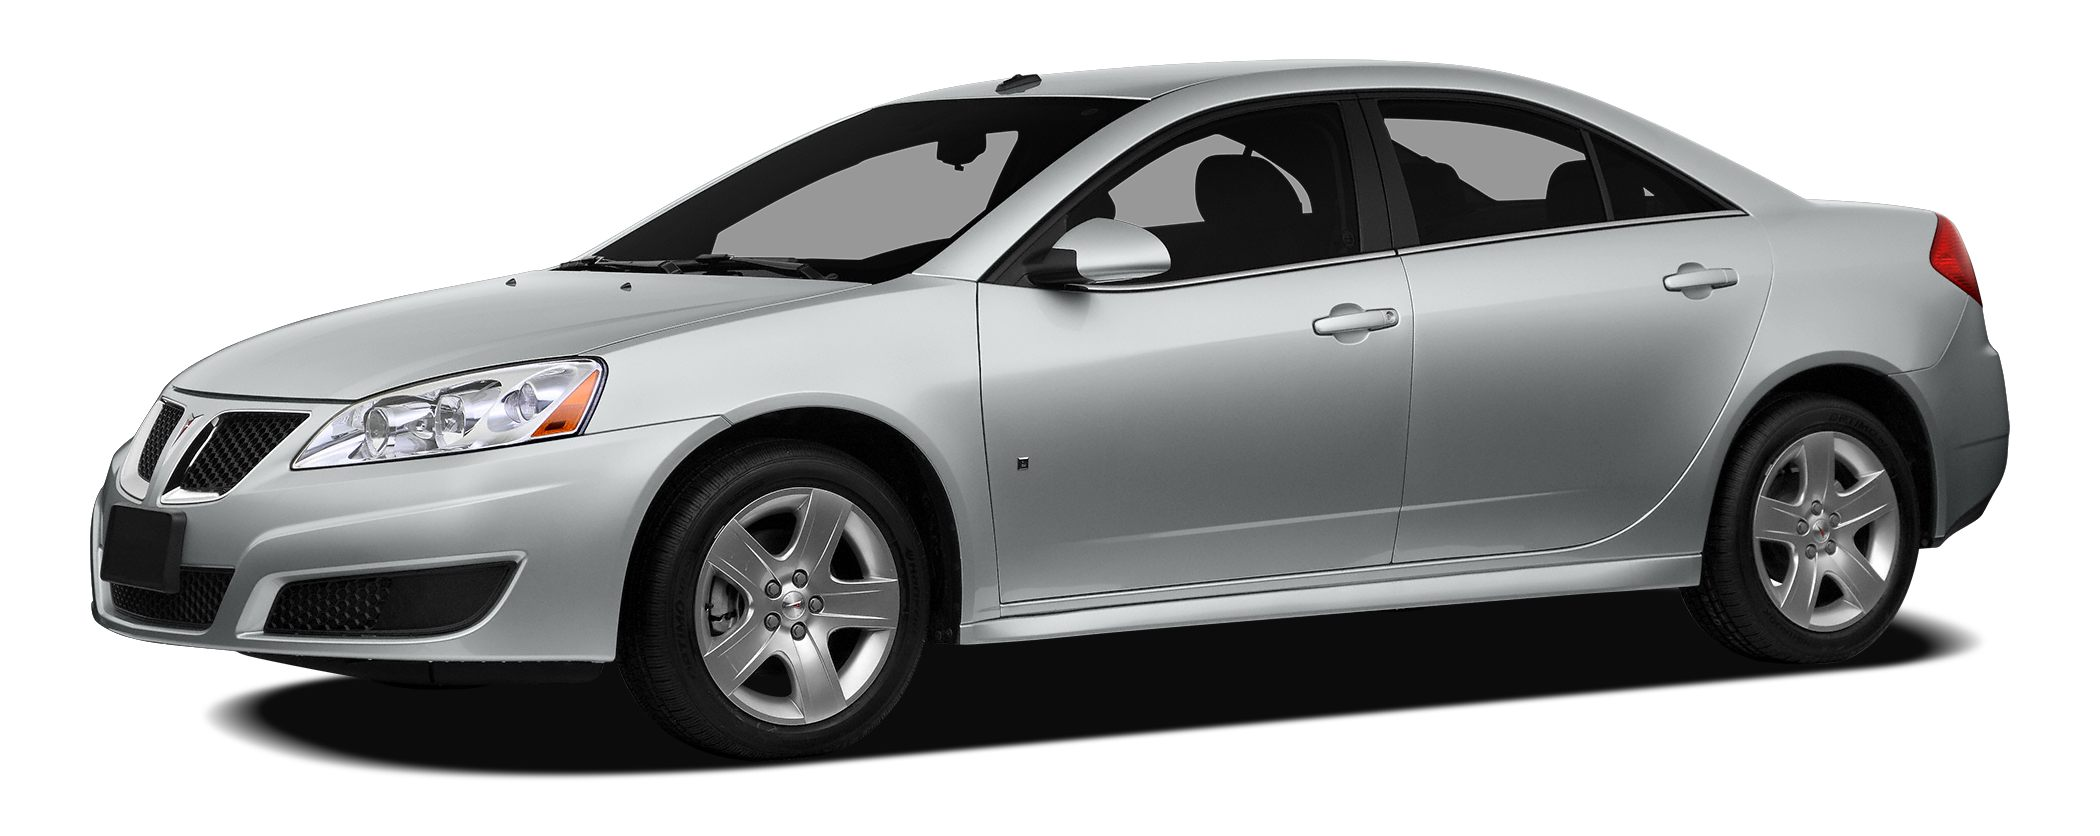 2010 Pontiac G6 Base Miles 114562Color Silver Stock SB16431A VIN 1G2ZA5EB0A4104028